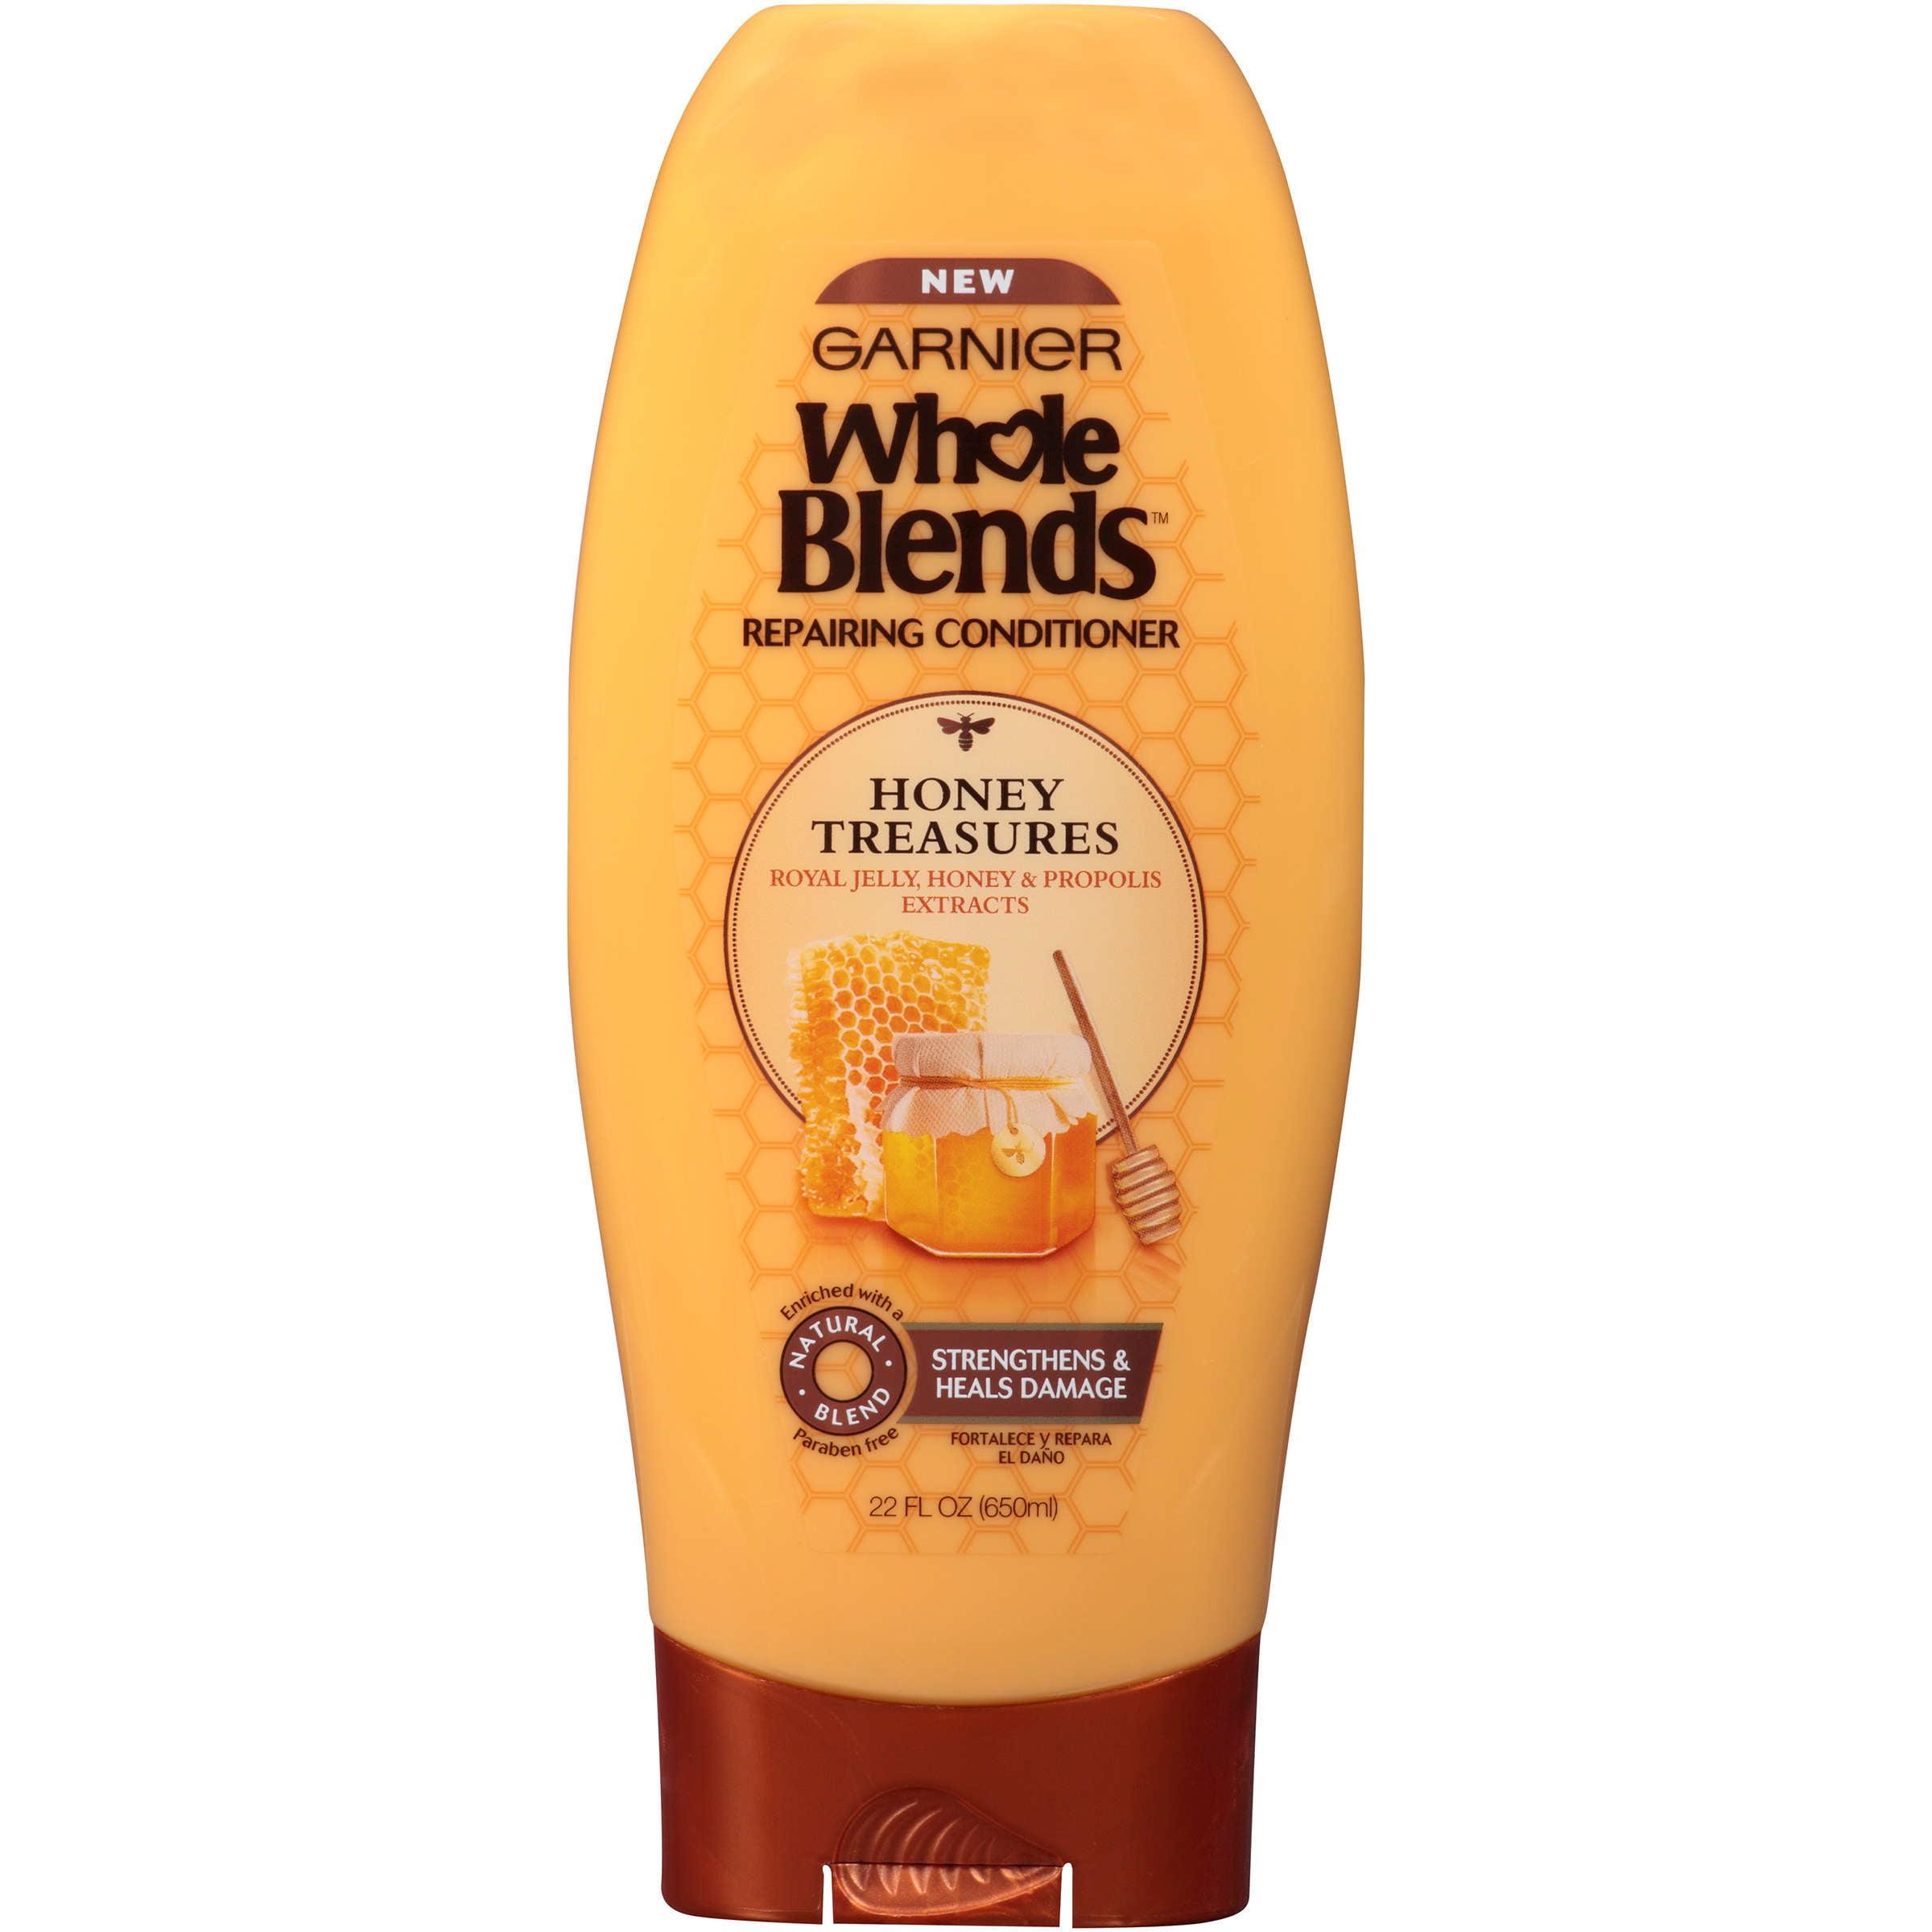 Garnier Whole Blends Repairing Conditioner Honey Treasures 22 FL OZ